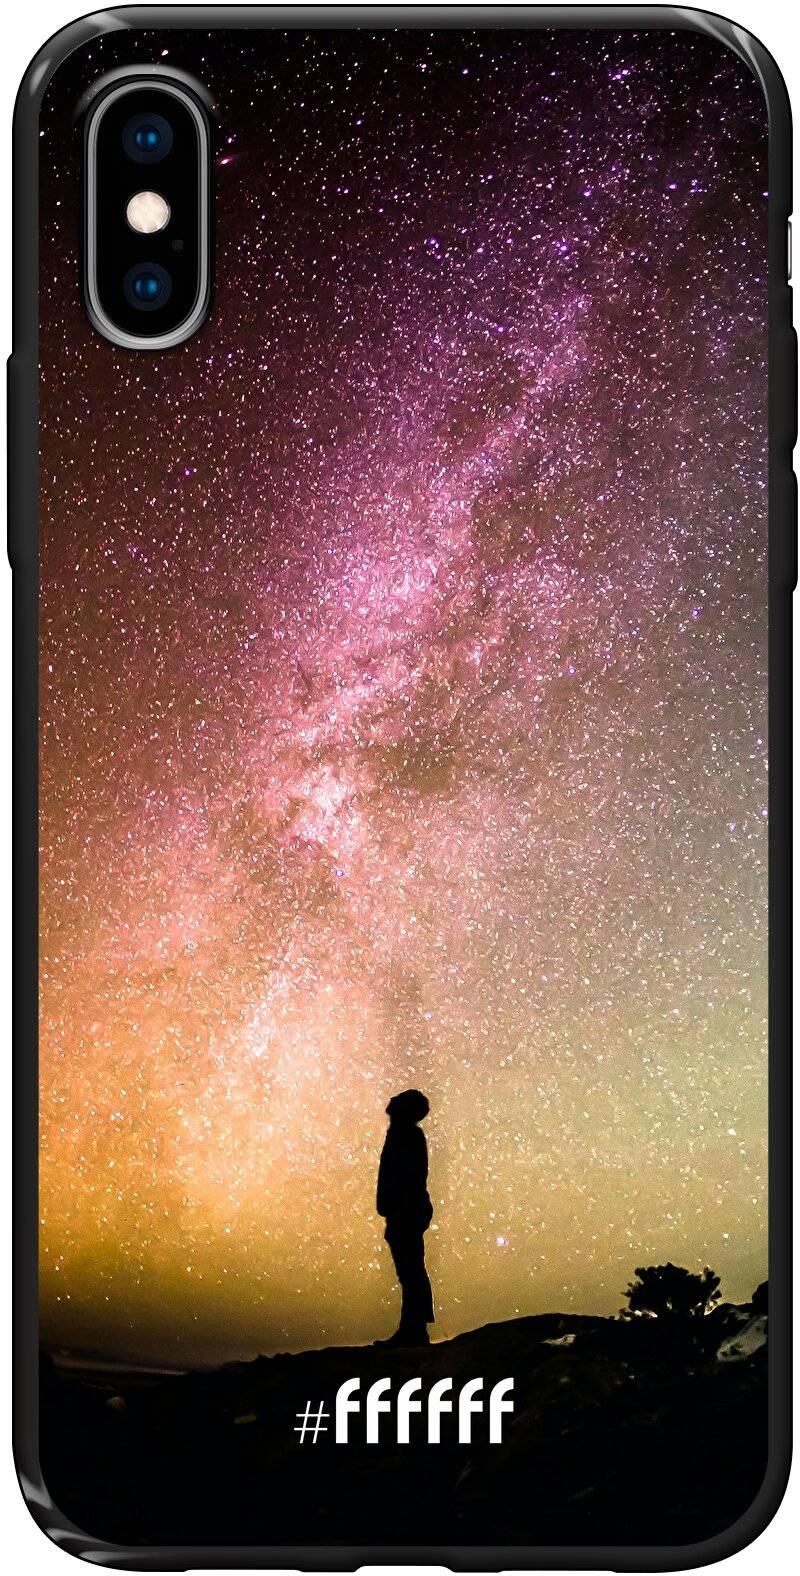 Watching the Stars iPhone X